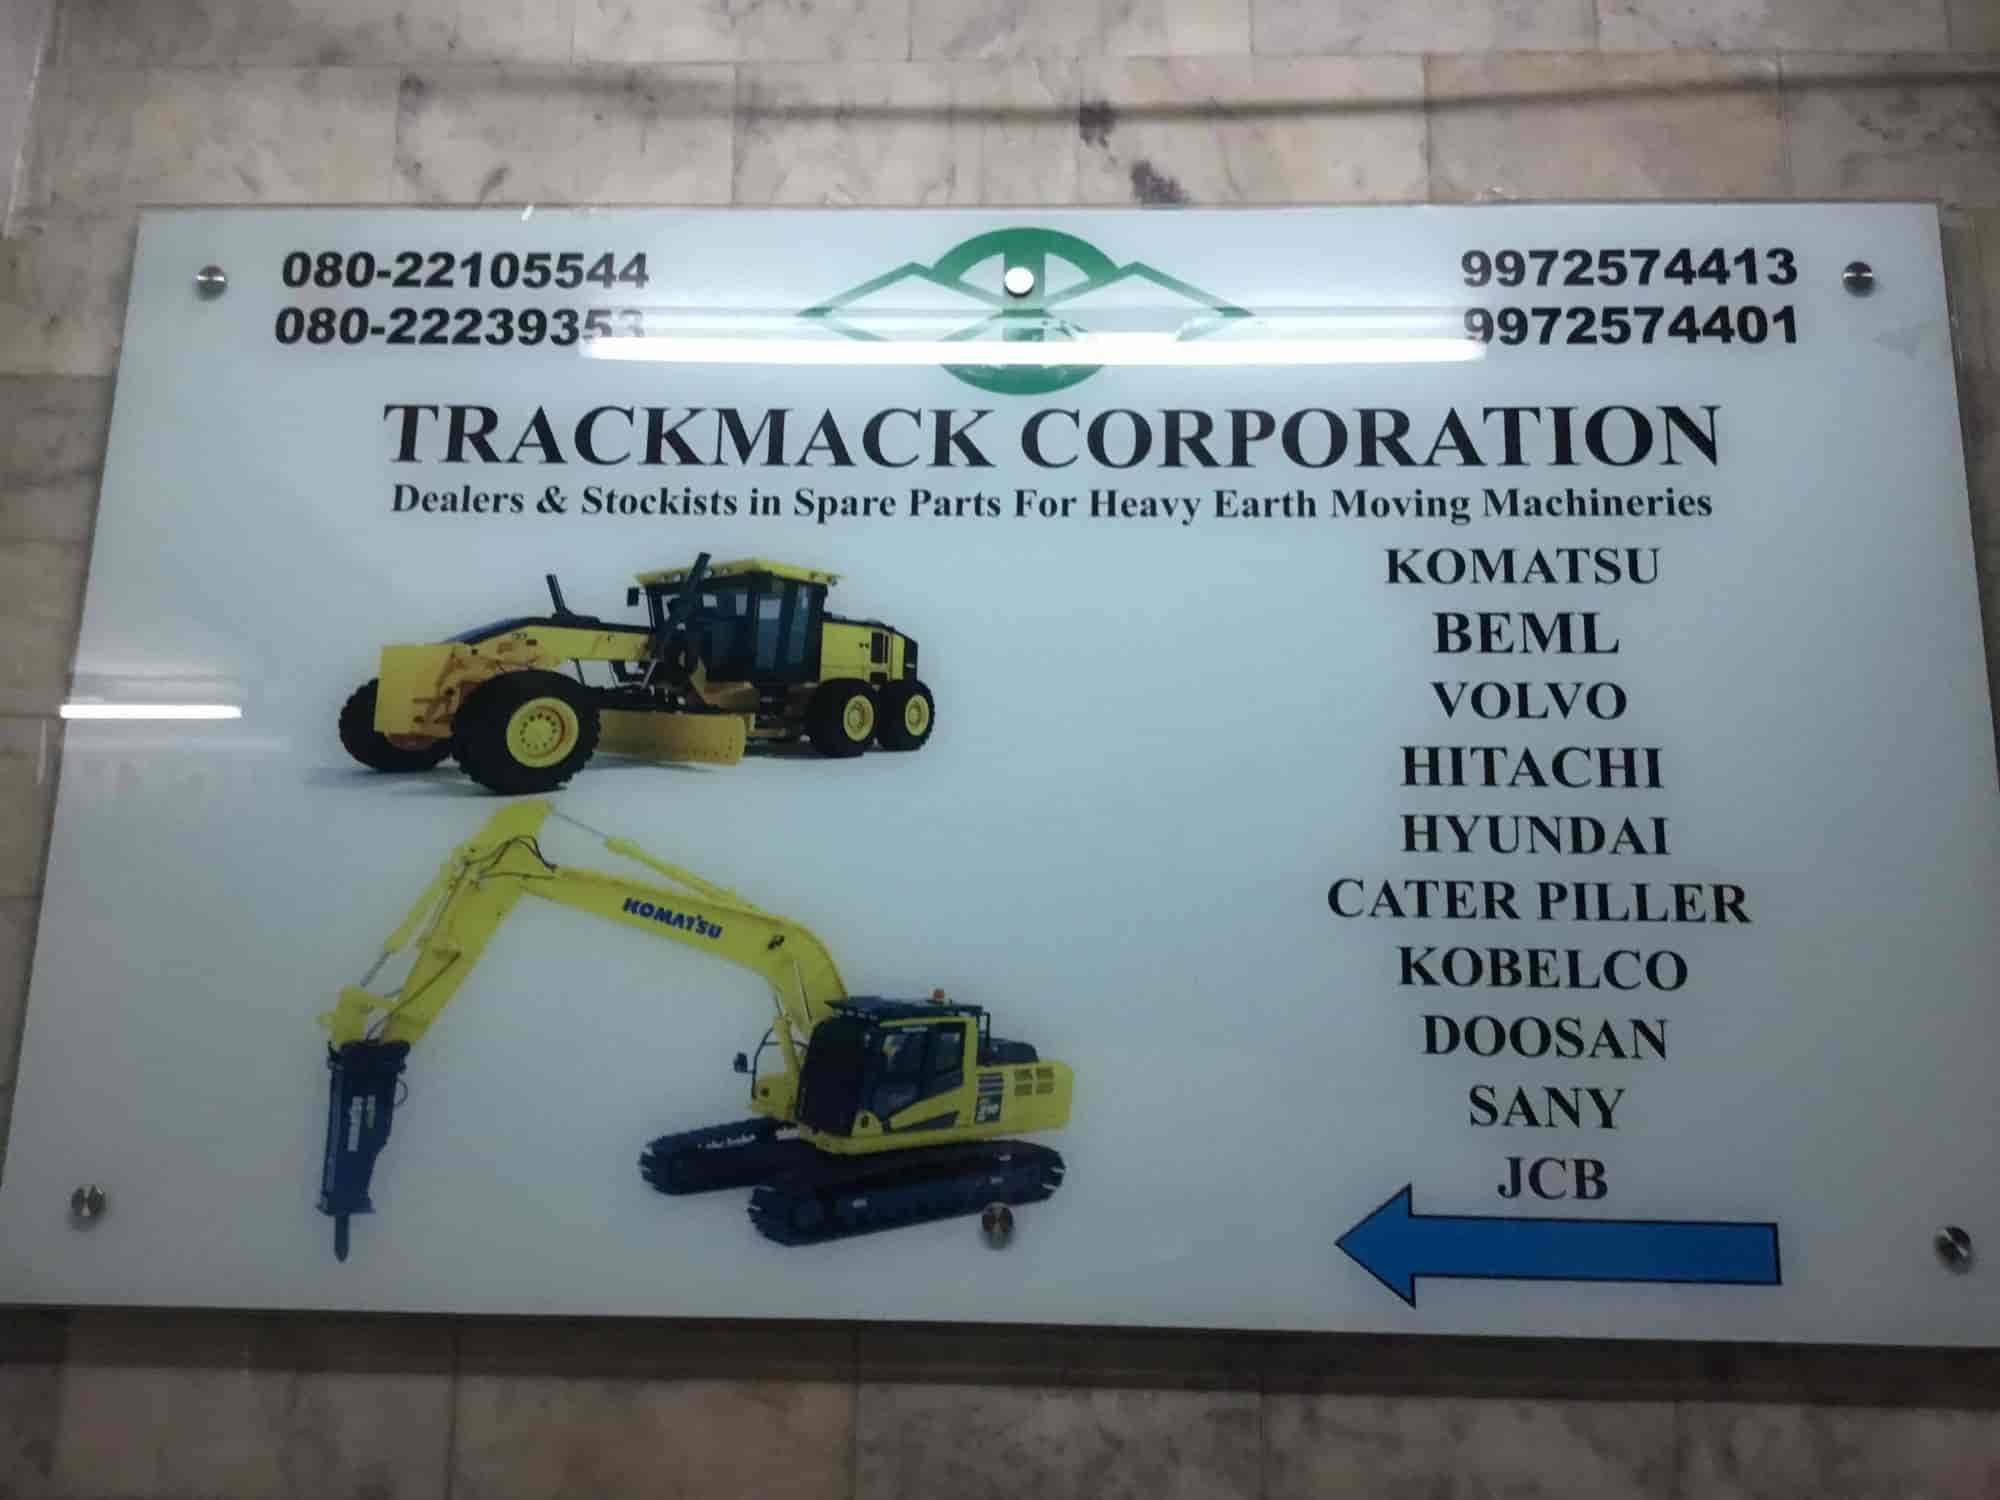 Trackmack Corporation, Jc Road - Building Contractors in